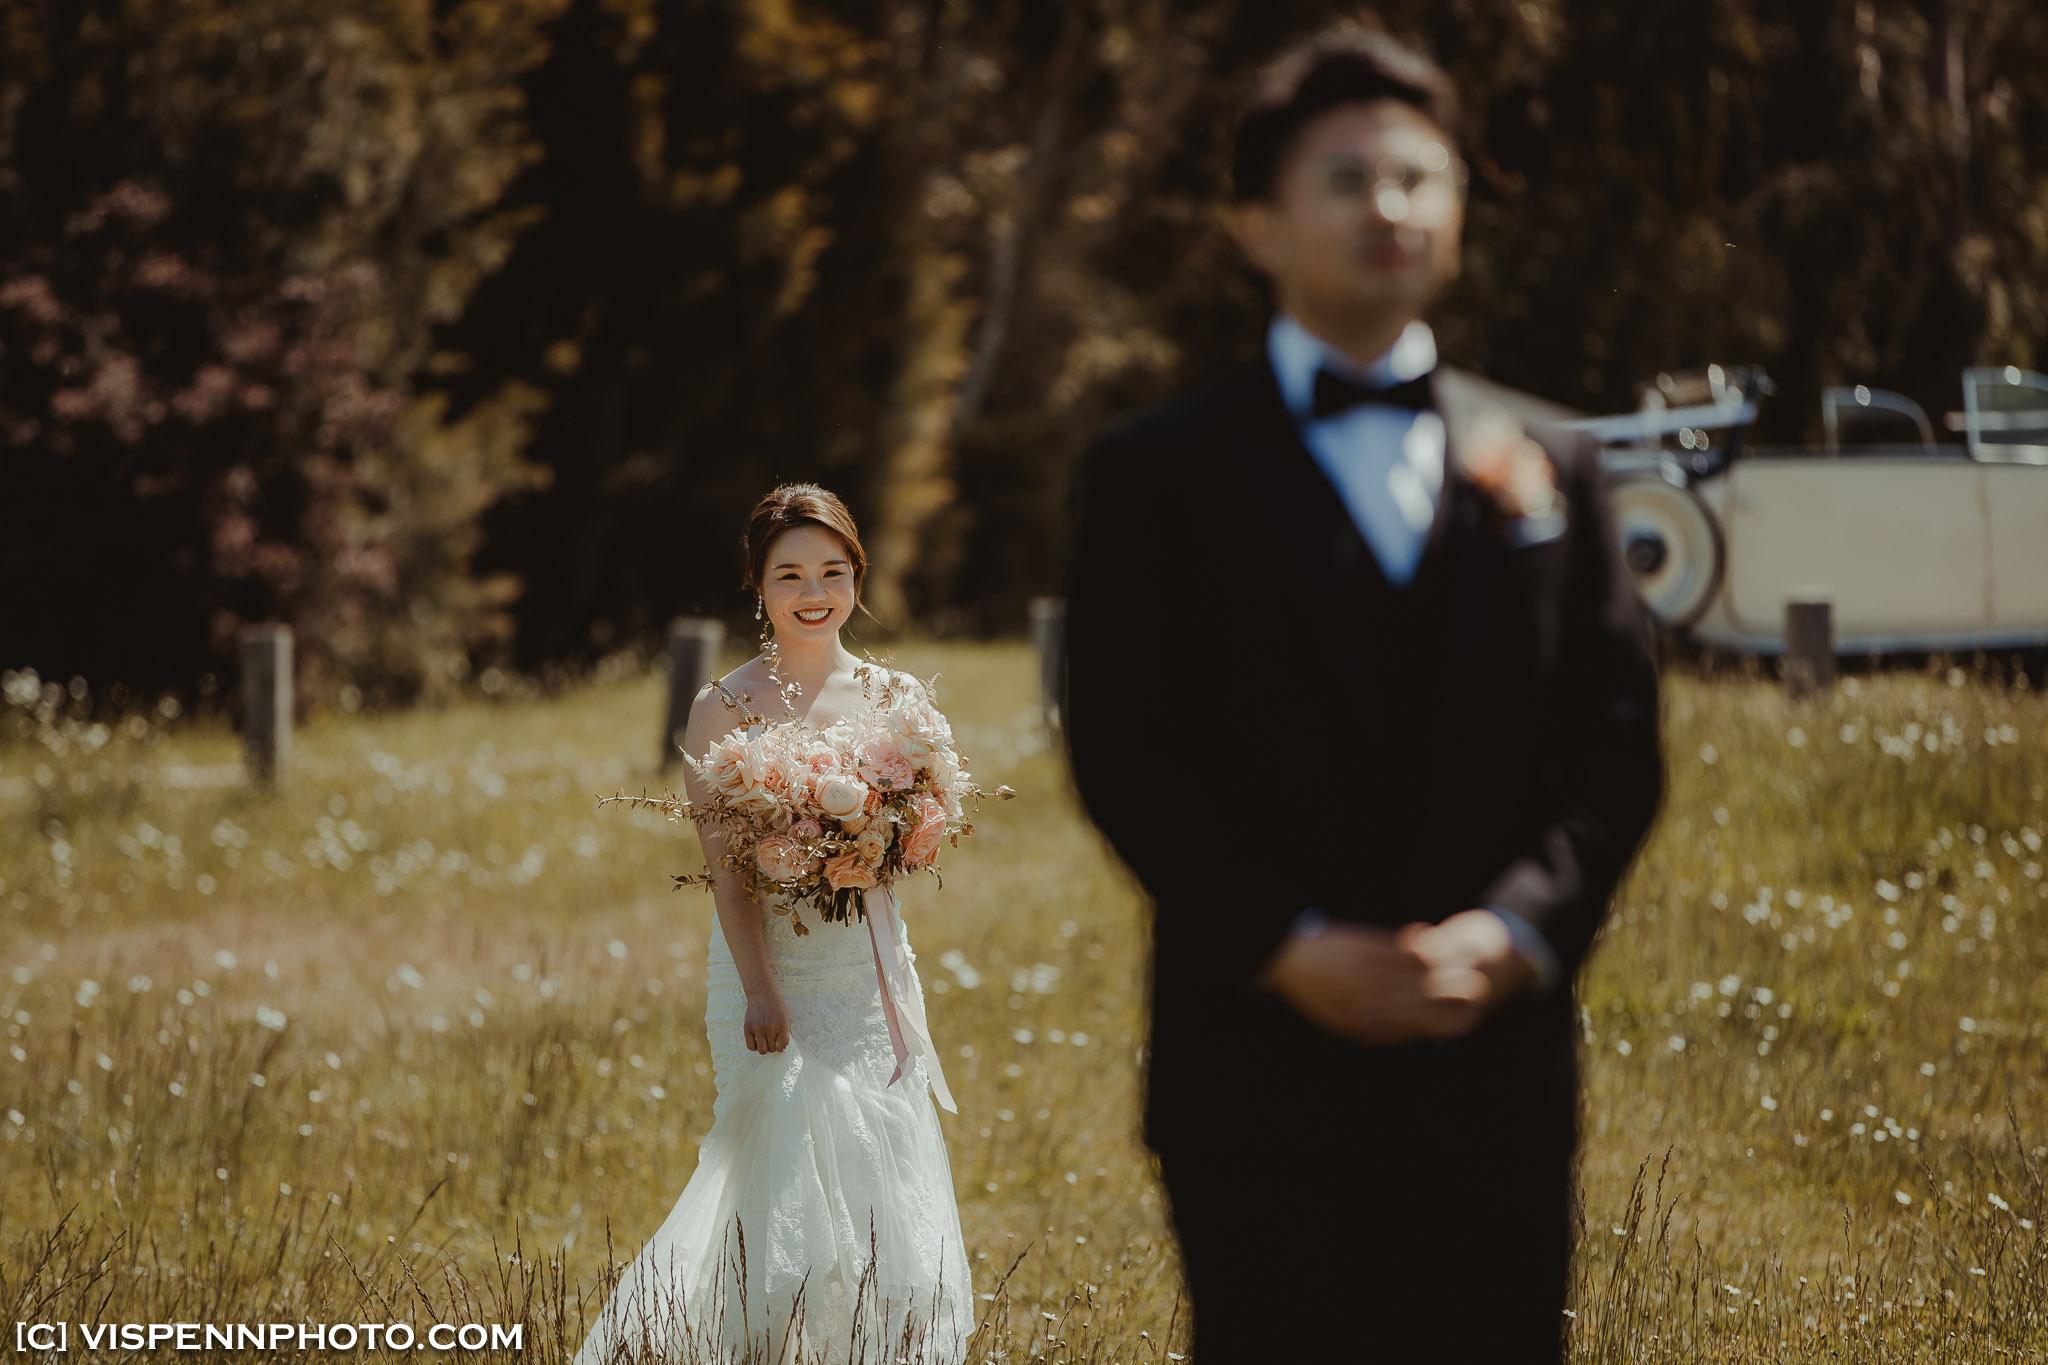 WEDDING DAY Photography Melbourne VISPENN 墨尔本 婚礼跟拍 婚礼摄像 婚礼摄影 结婚照 登记照 ElitaPB 05347 2P 1DX2 VISPENN